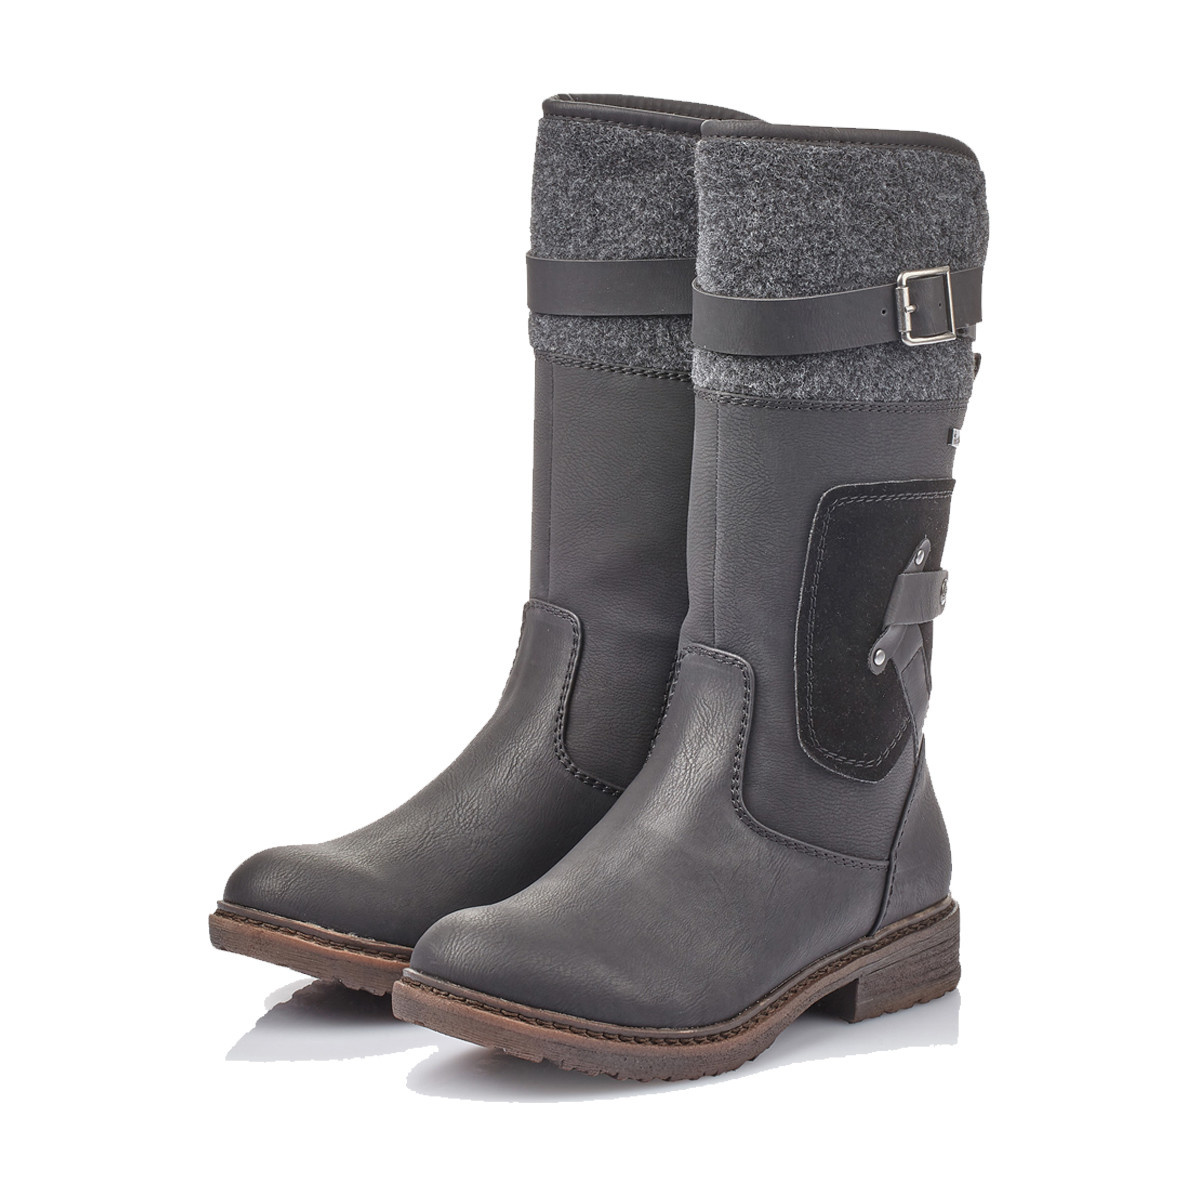 Rieker Rieker Women's Mid-Boot 94761-00 Black